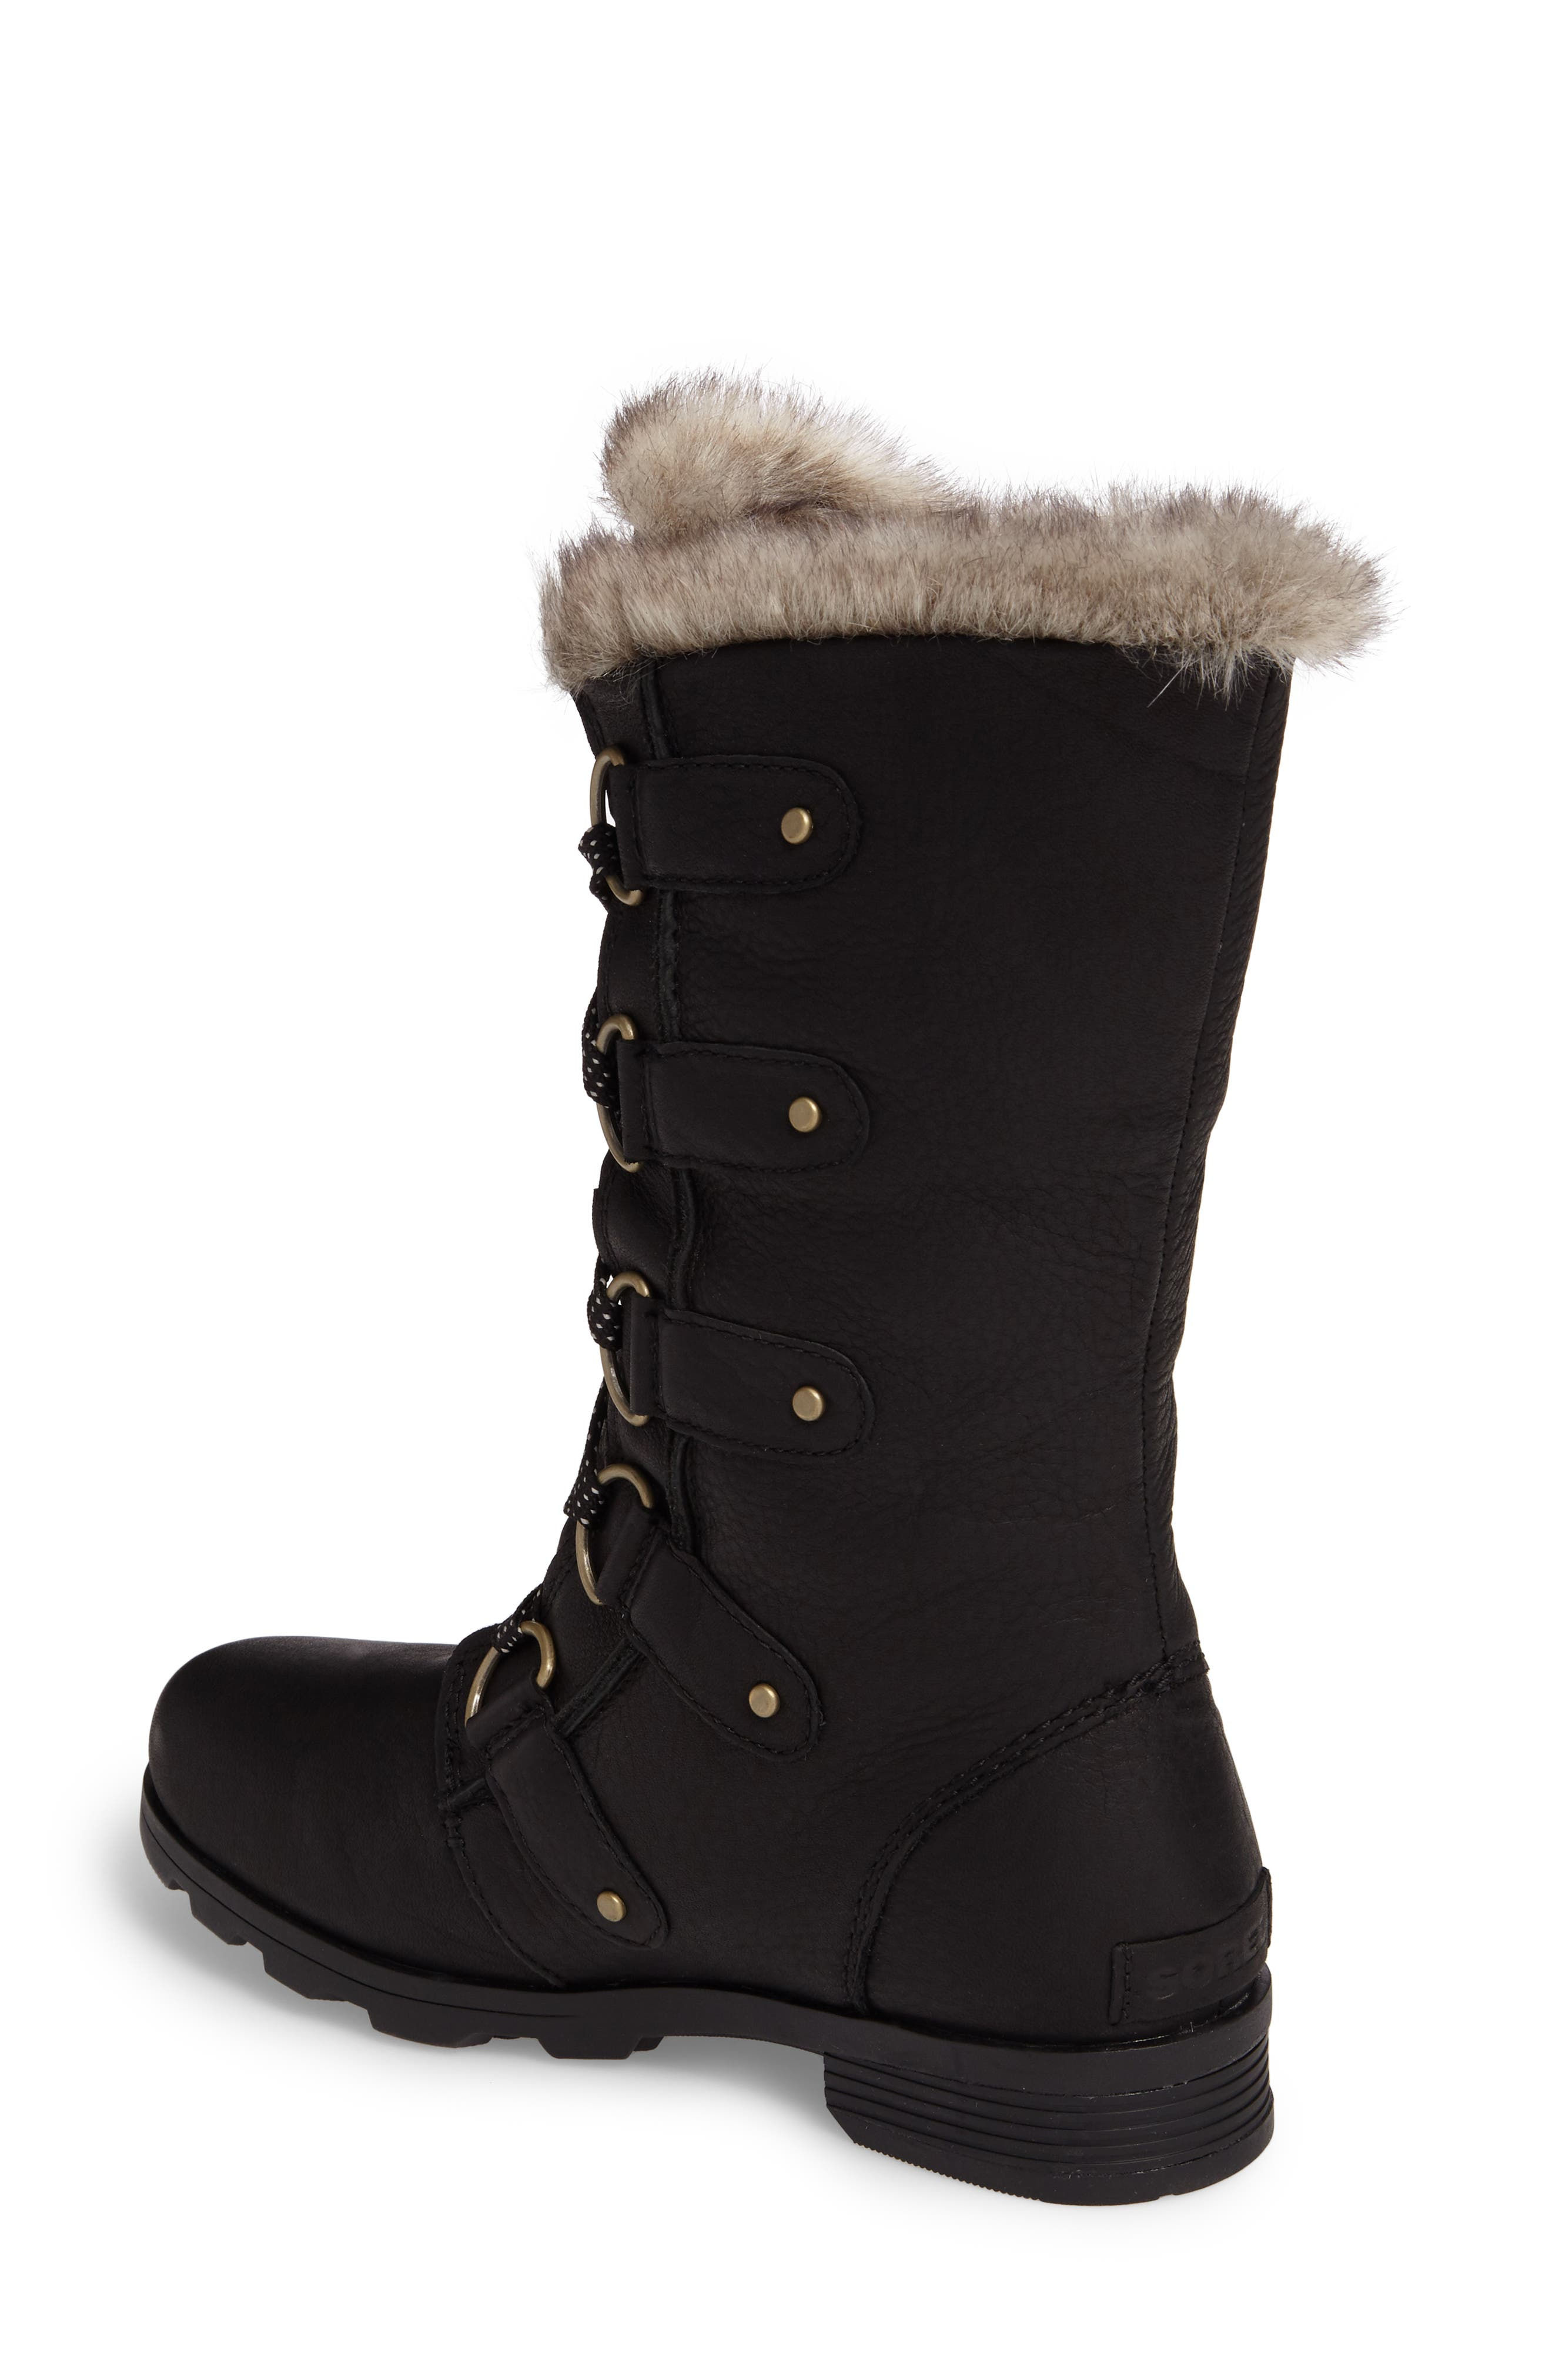 Emelie Waterproof Lace Up Boot with Faux Fur Trim,                             Alternate thumbnail 2, color,                             010